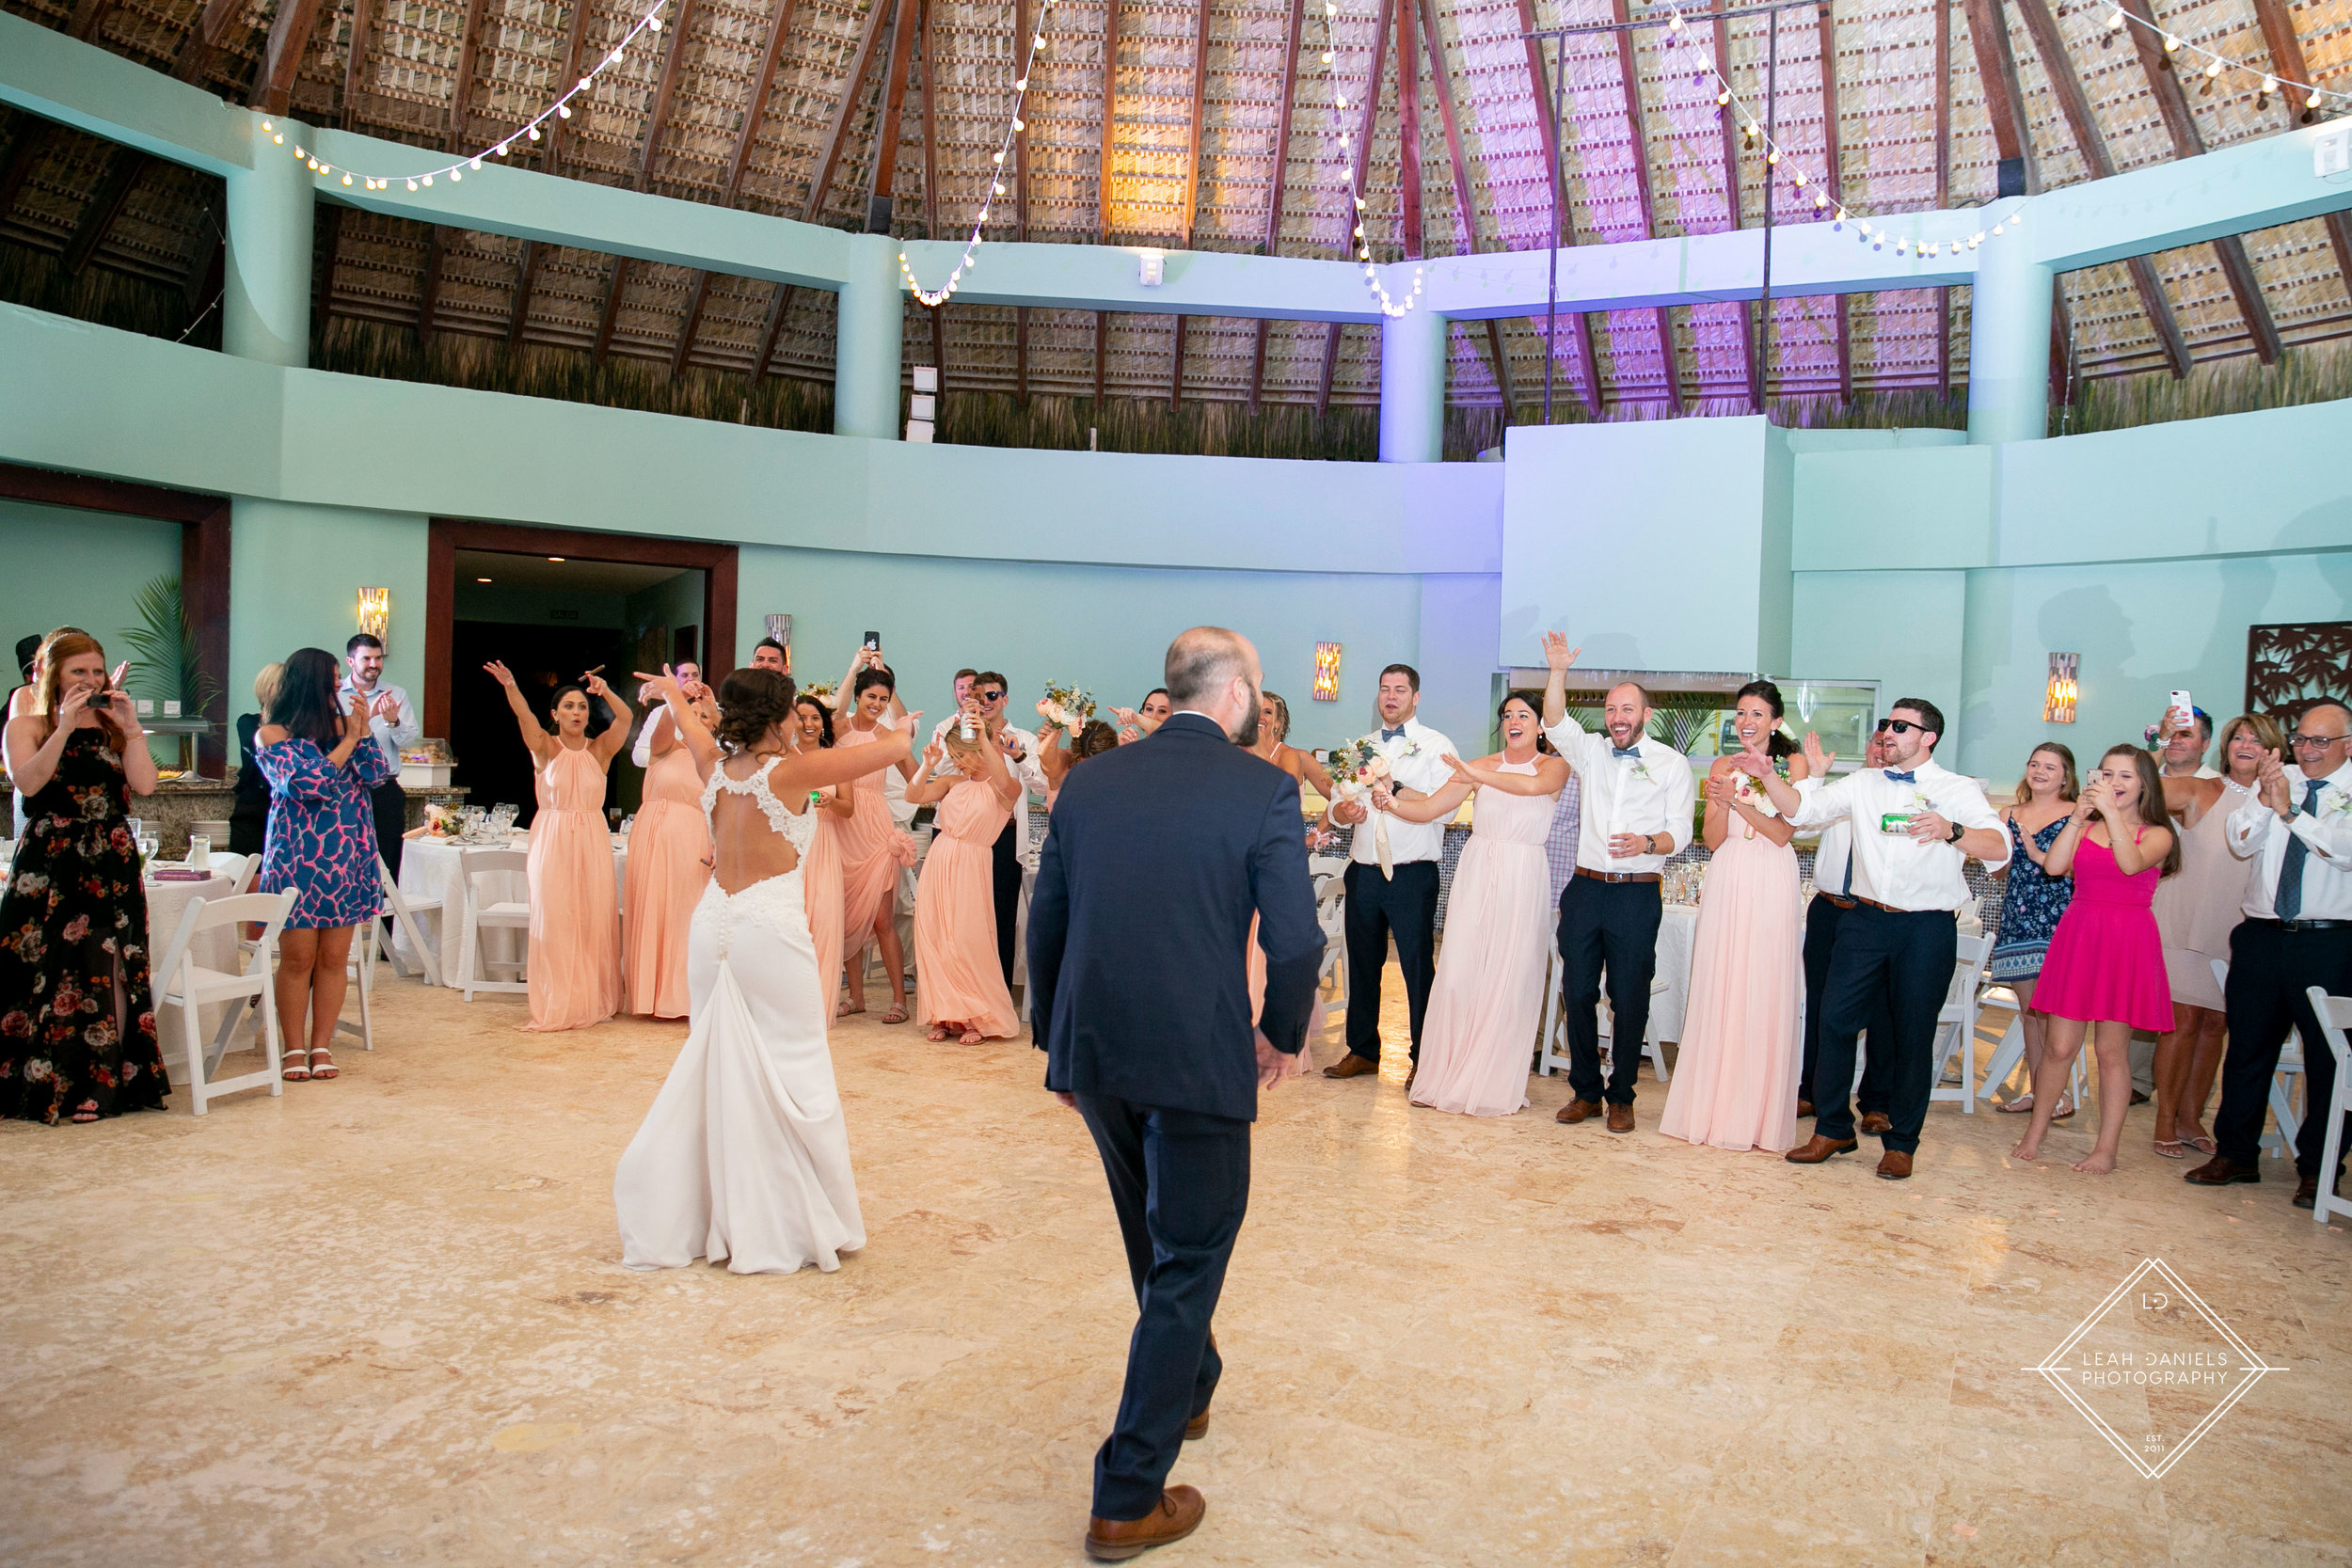 NOW Larimar Destination Wedding; The Bride and Groom grand entrance